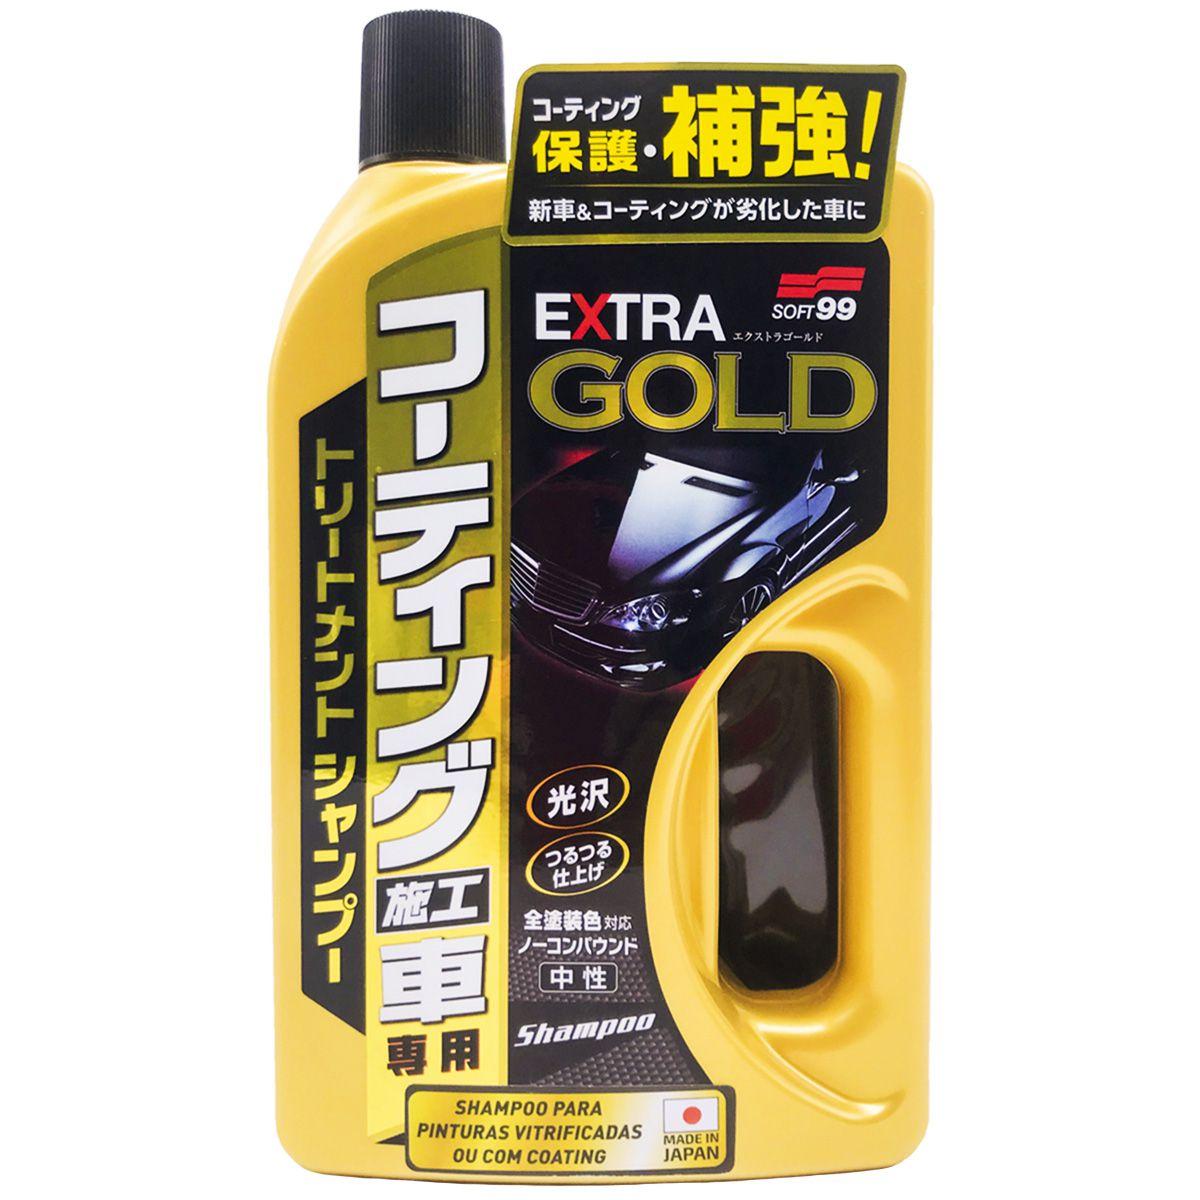 Shampoo Extra Gold para Pinturas Vitrificadas ou Coating 750ml Soft99